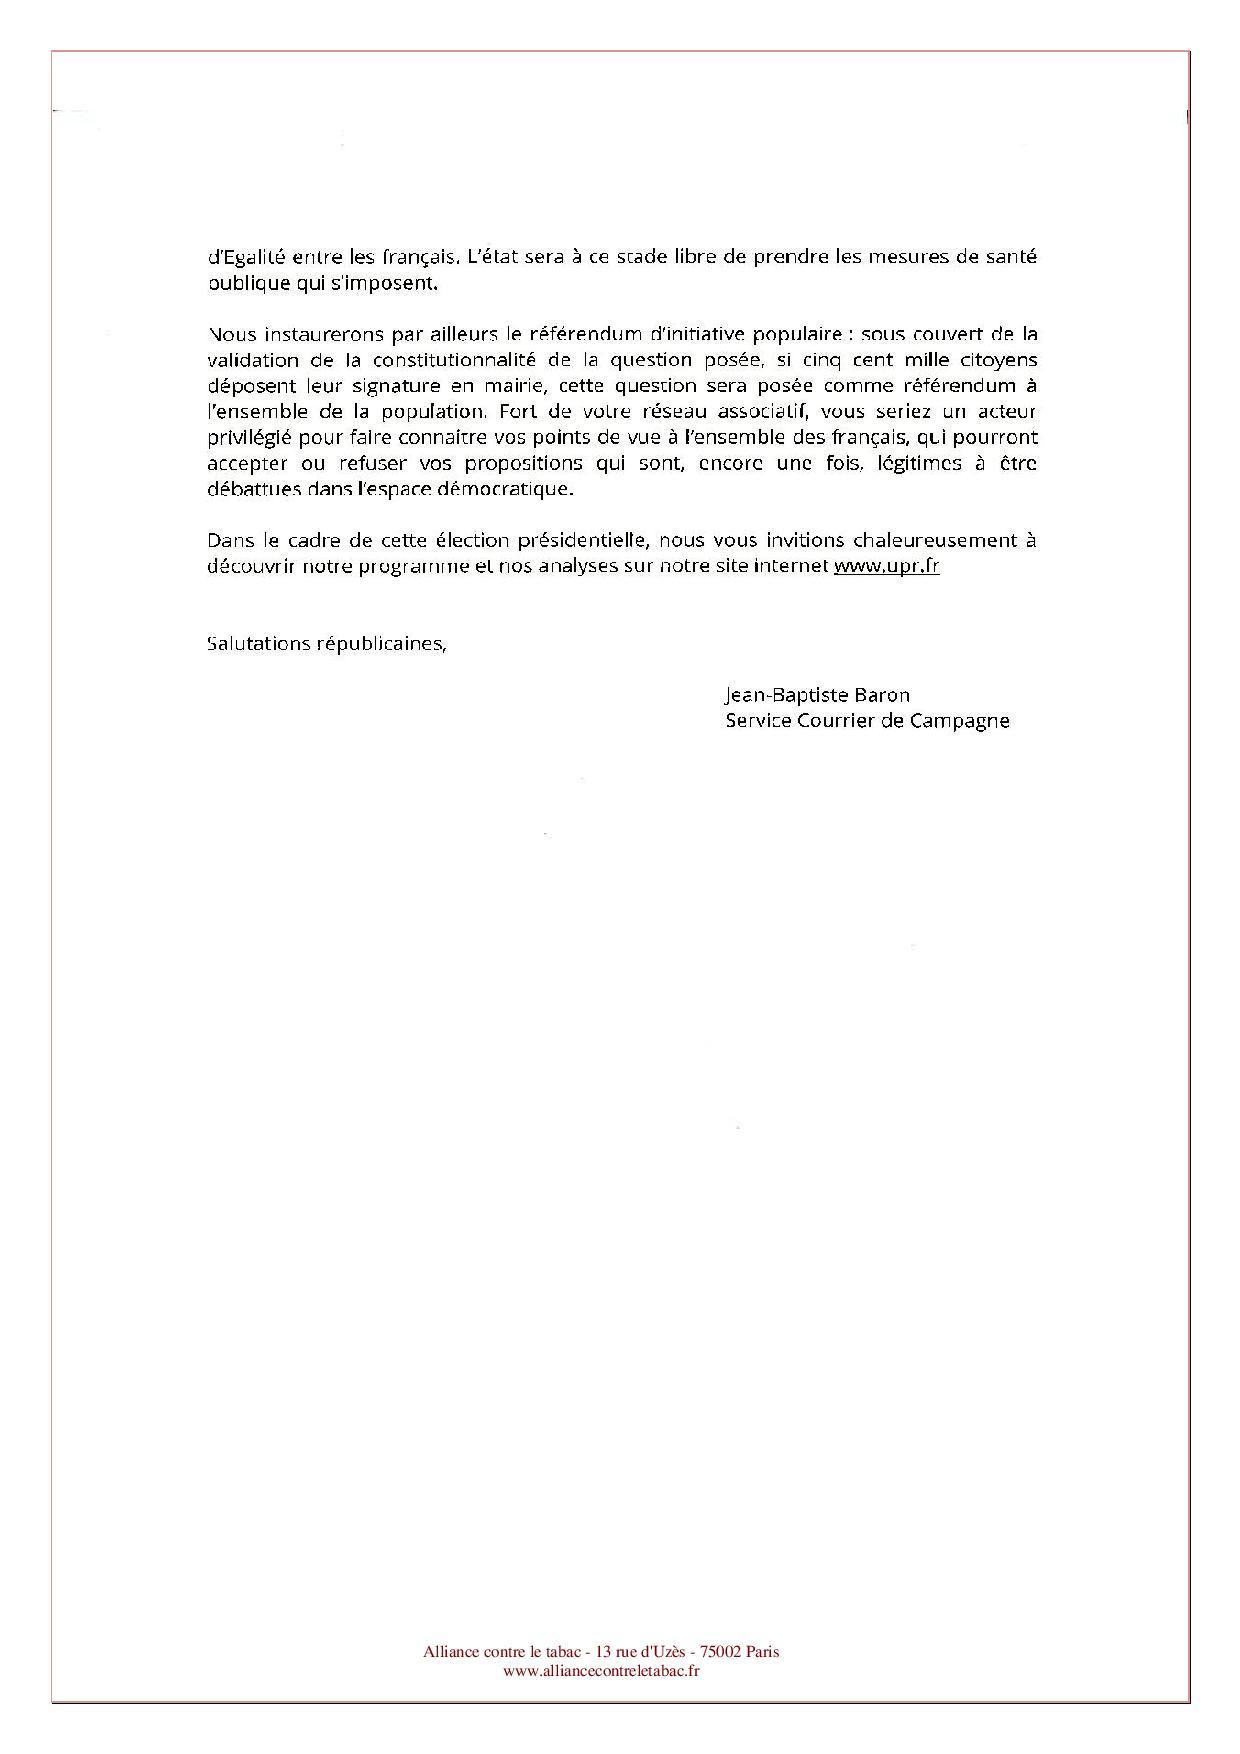 Alliance contre le tabac - DP - 11042017-page-012.jpg